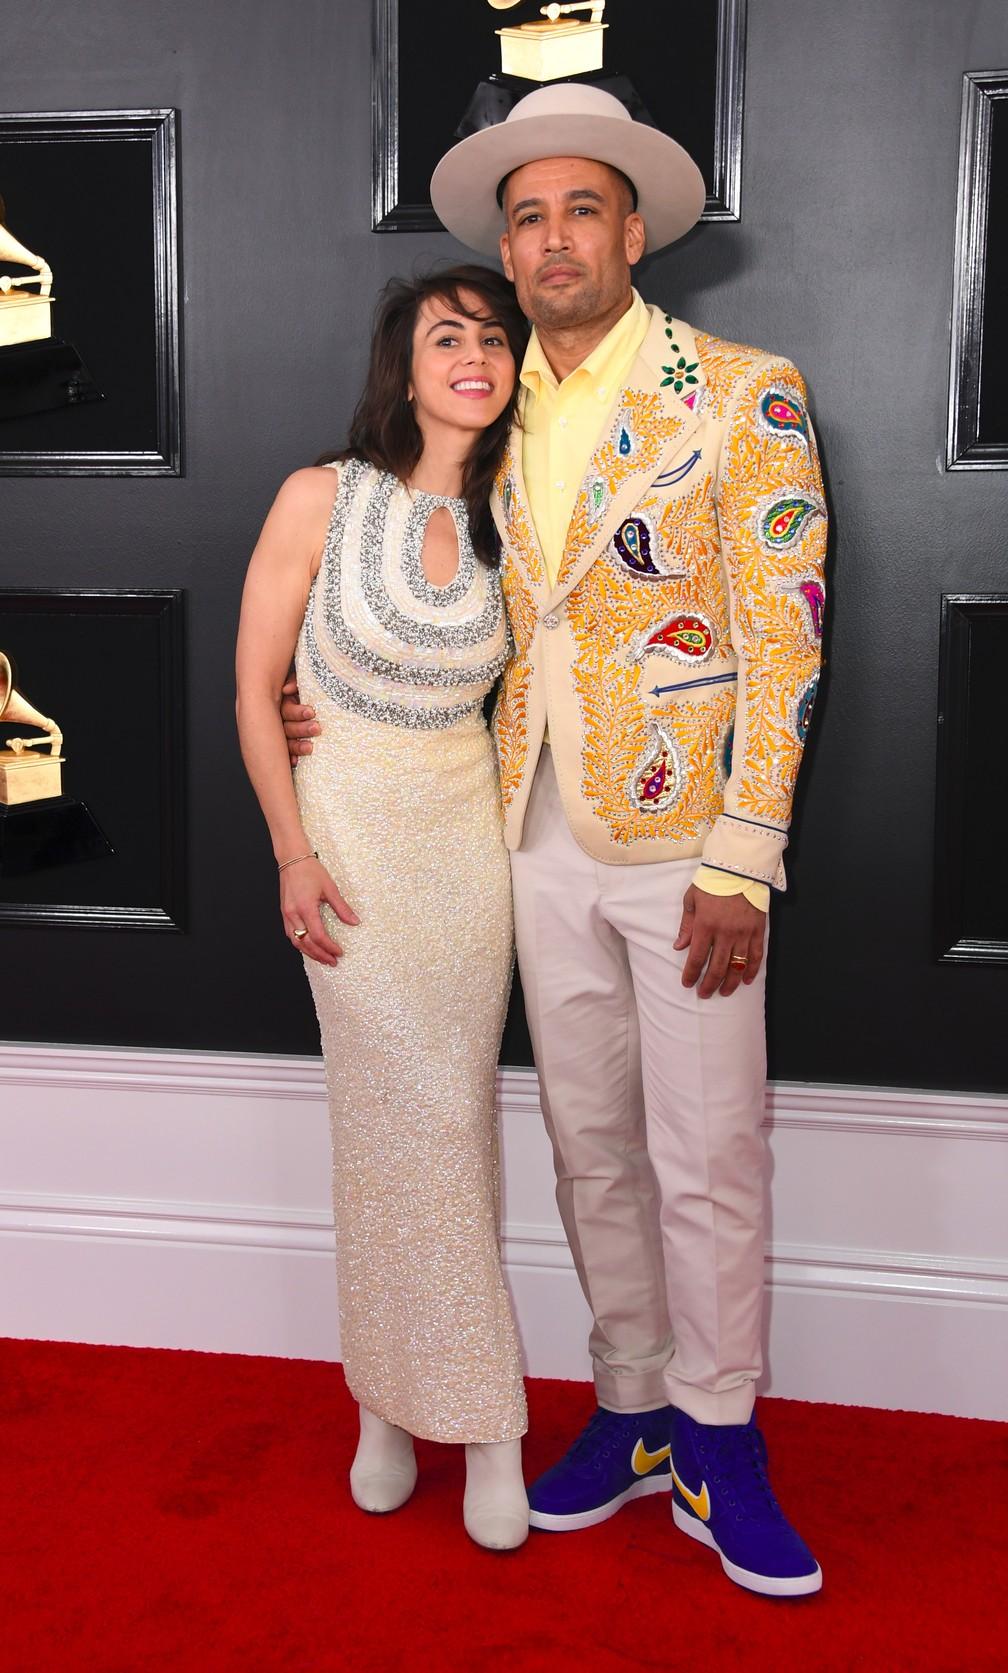 Ben Harper e sua esposa Jacyn Matfus no Grammy 2019 — Foto: Valerie Macon/AFP